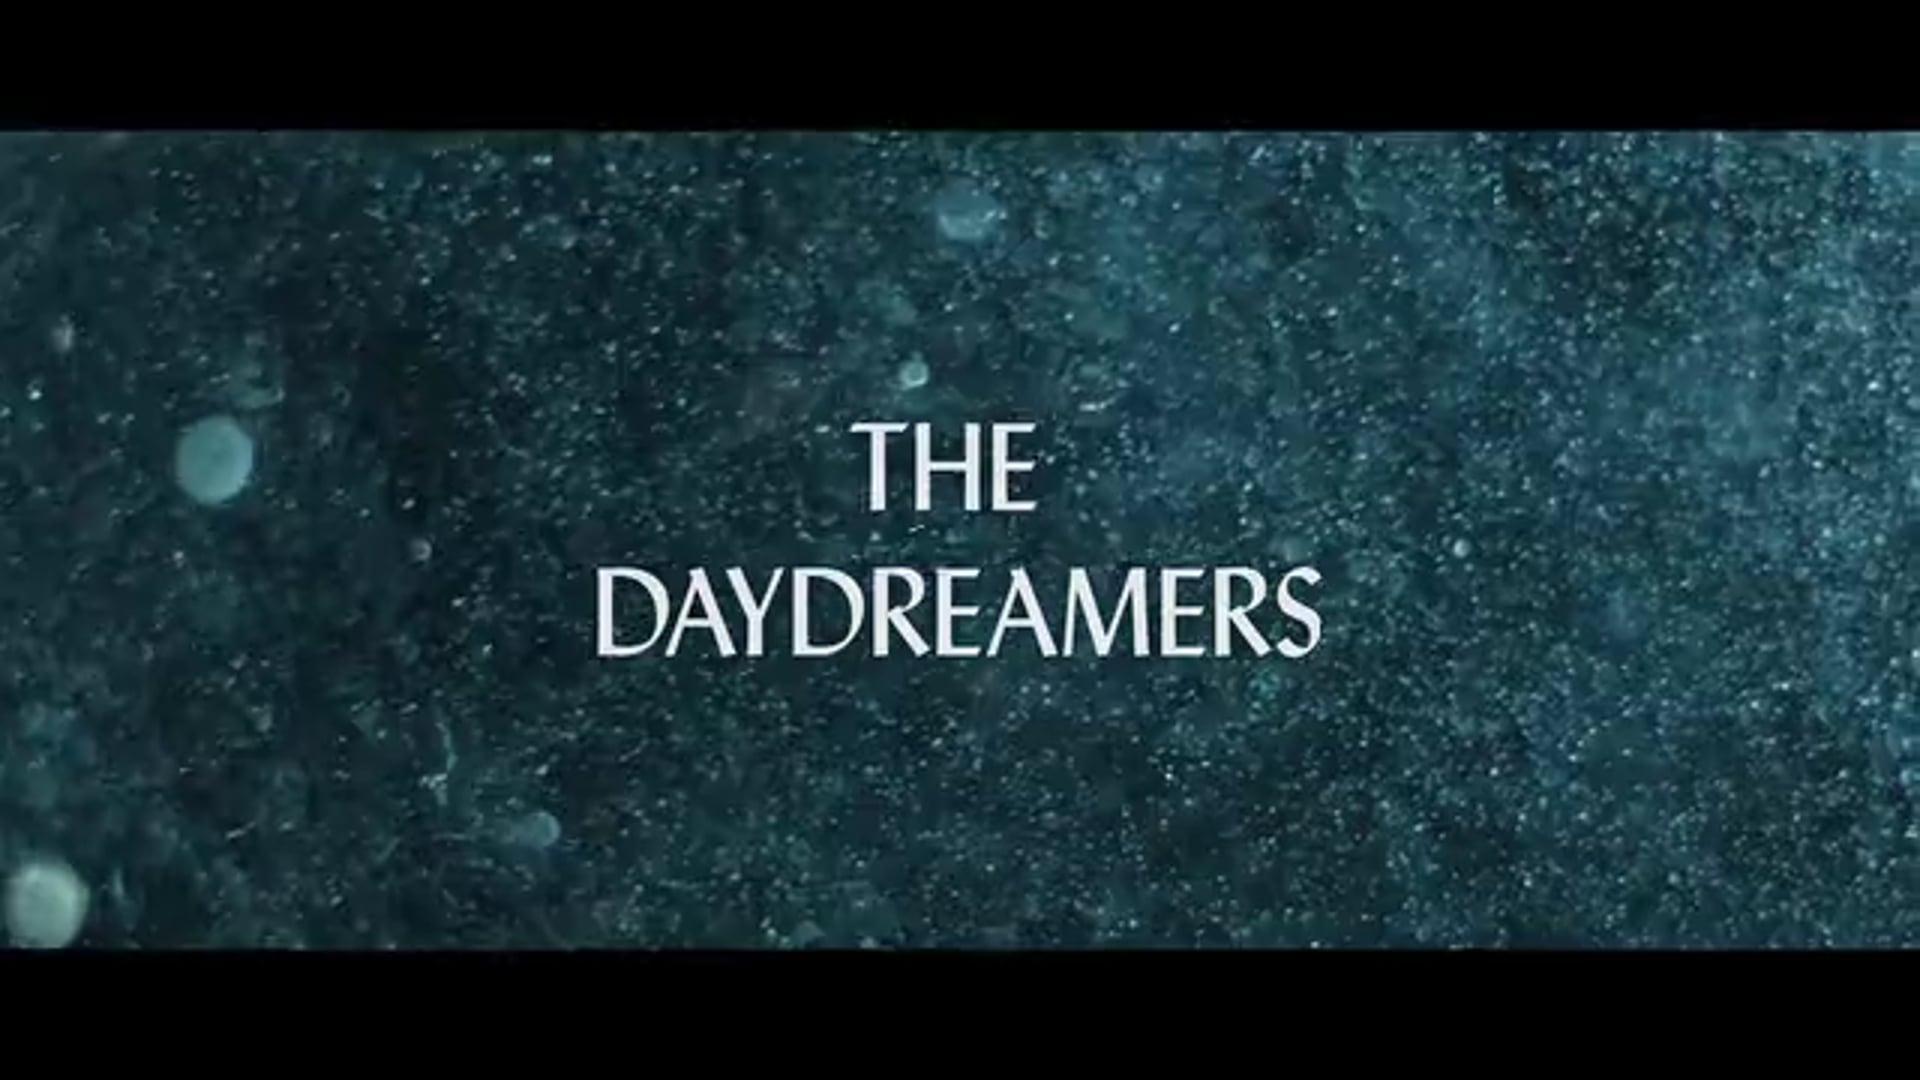 THE DAYDREAMERS - TRAILER - NFTS GRAD FILM - THOMAS RENCKENS